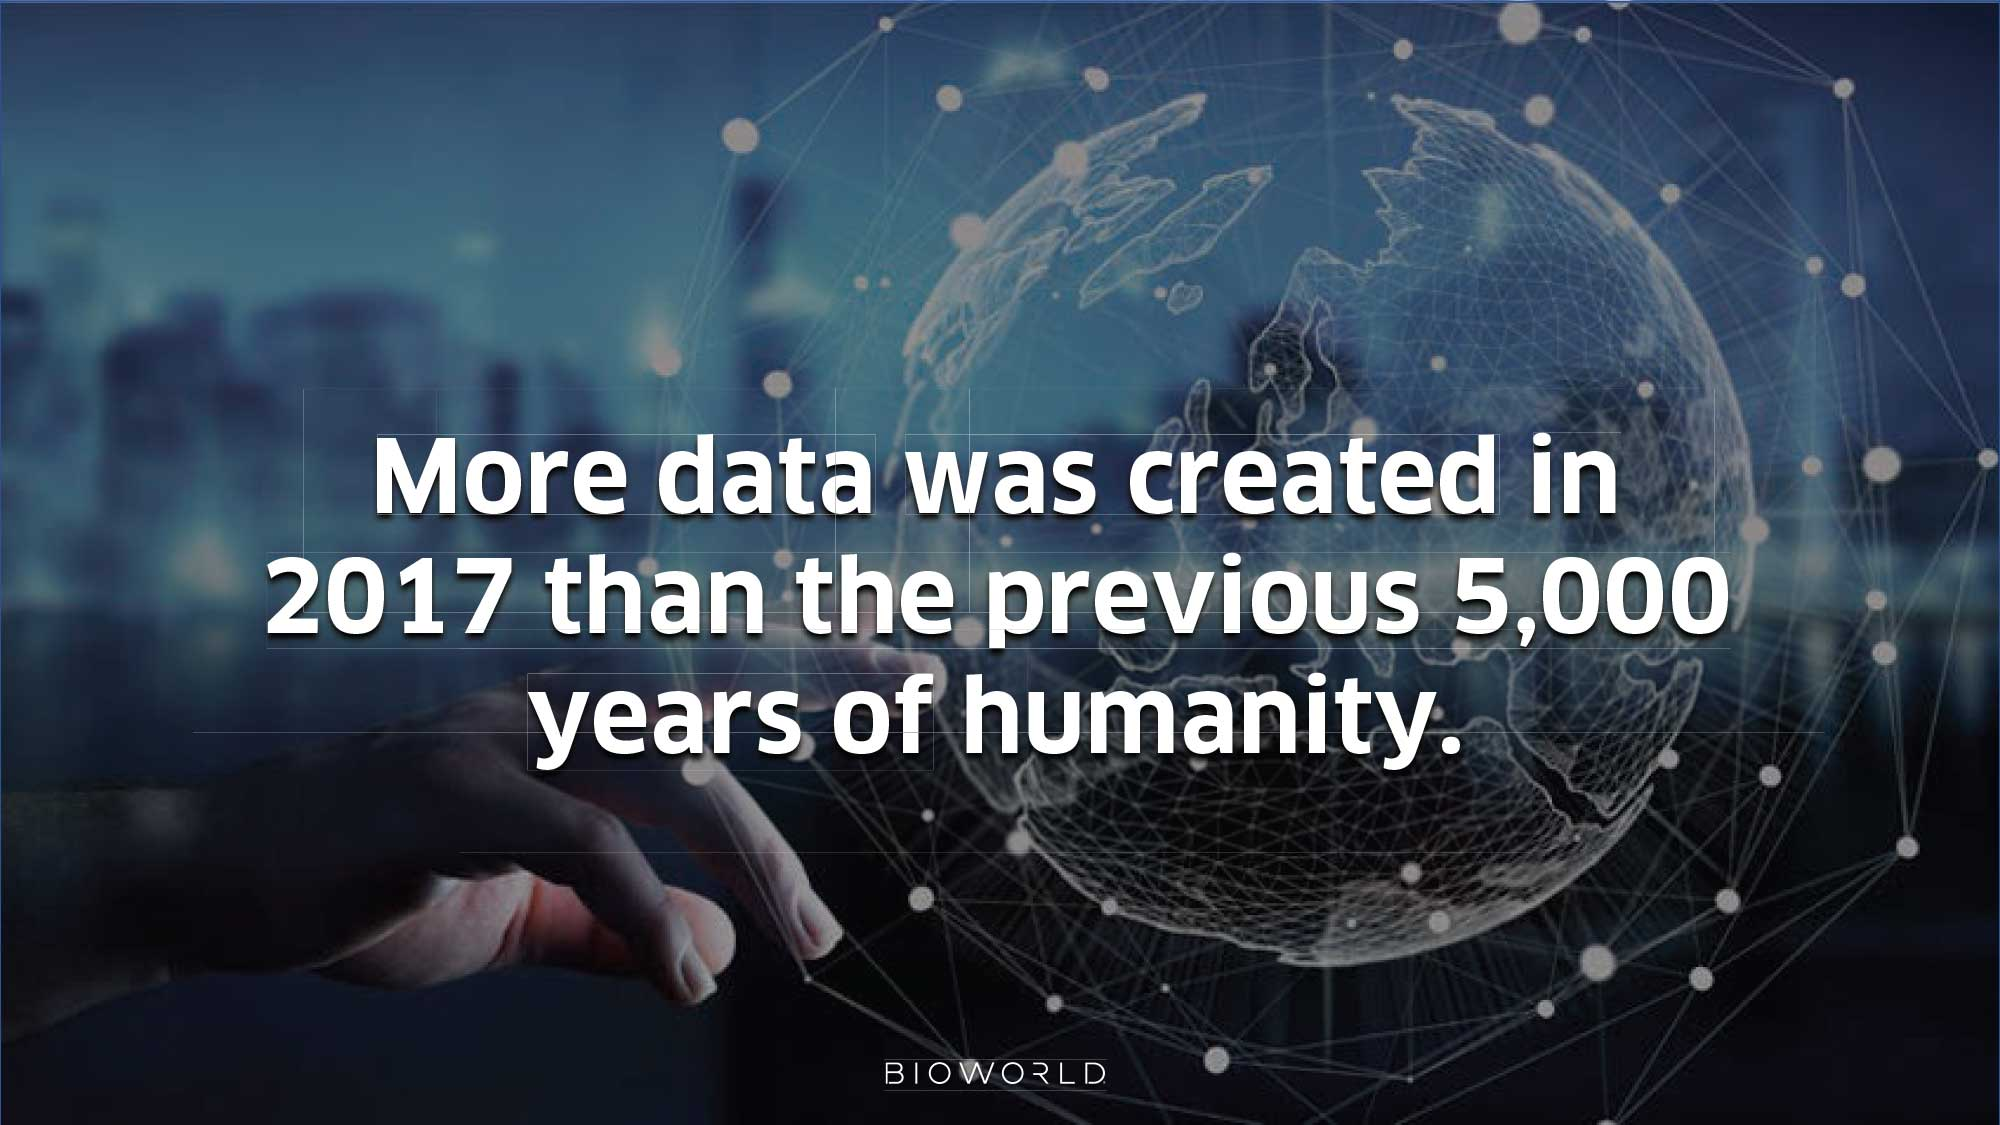 Bioworld's-Case-For-Data-Launch-4